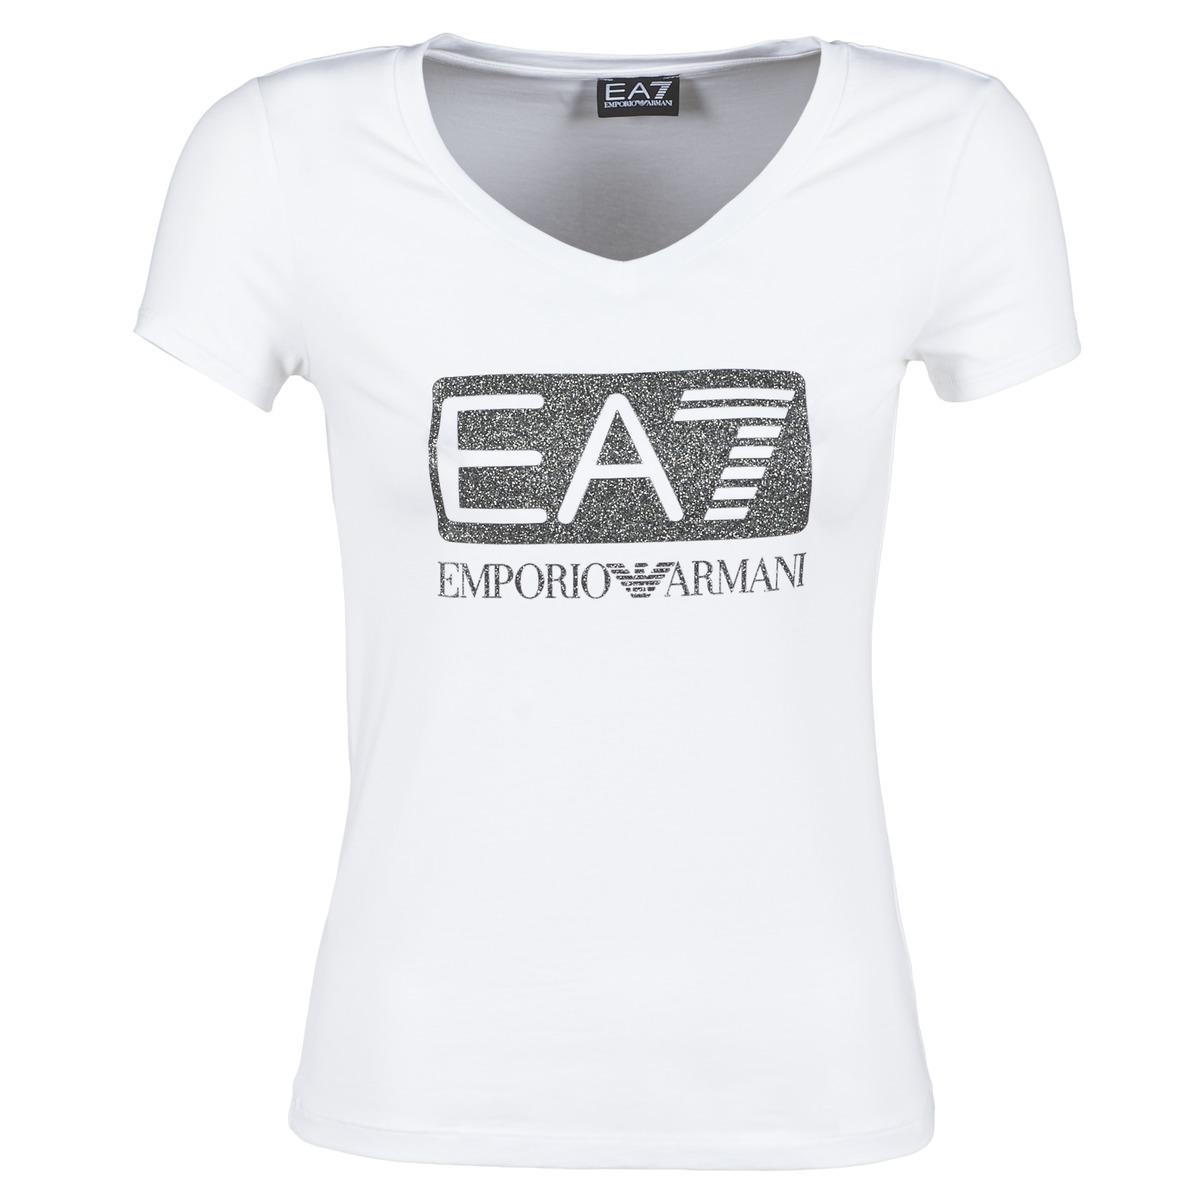 Emporio Armani EA7 FOUNAROLA Blanc